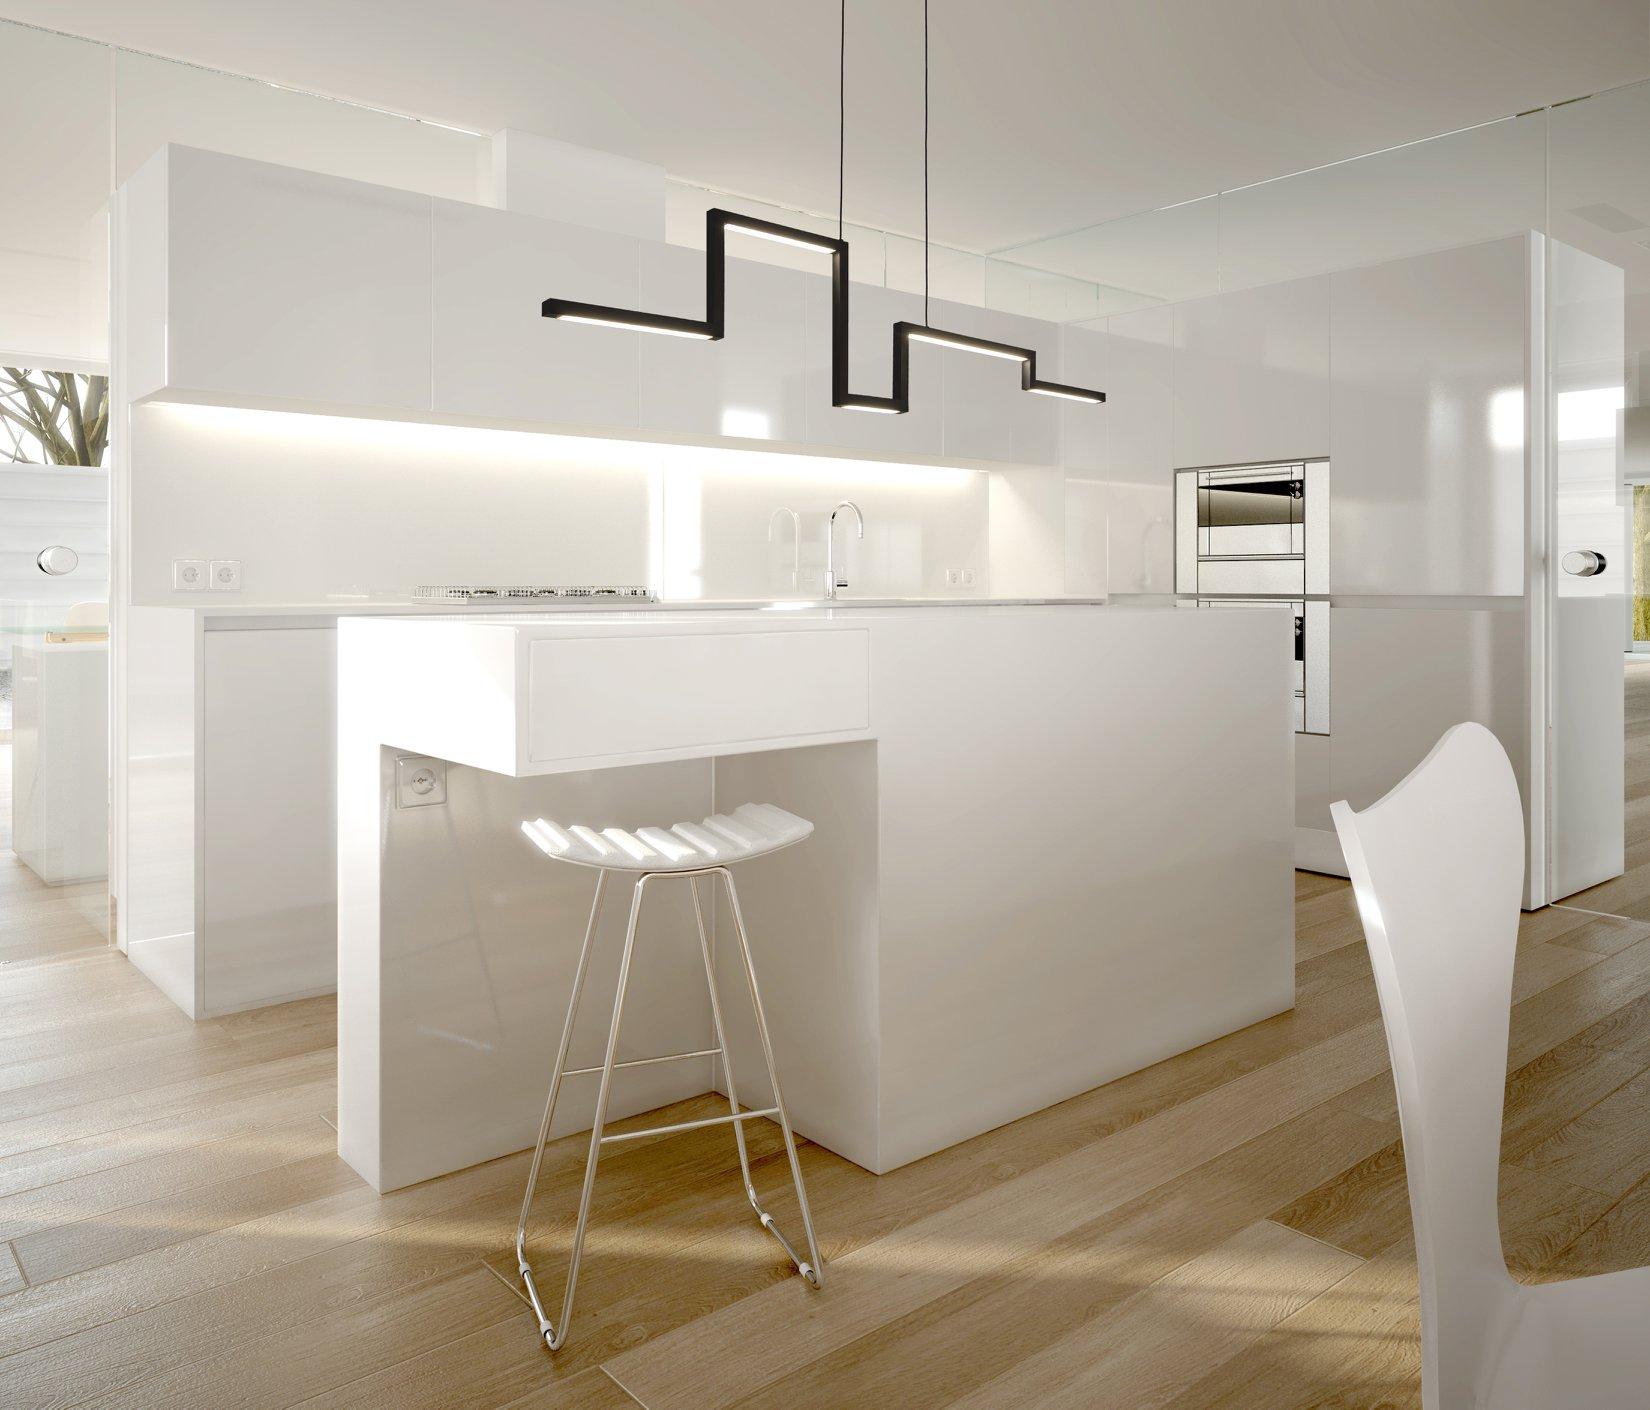 Ilfari Artys design hanglamp